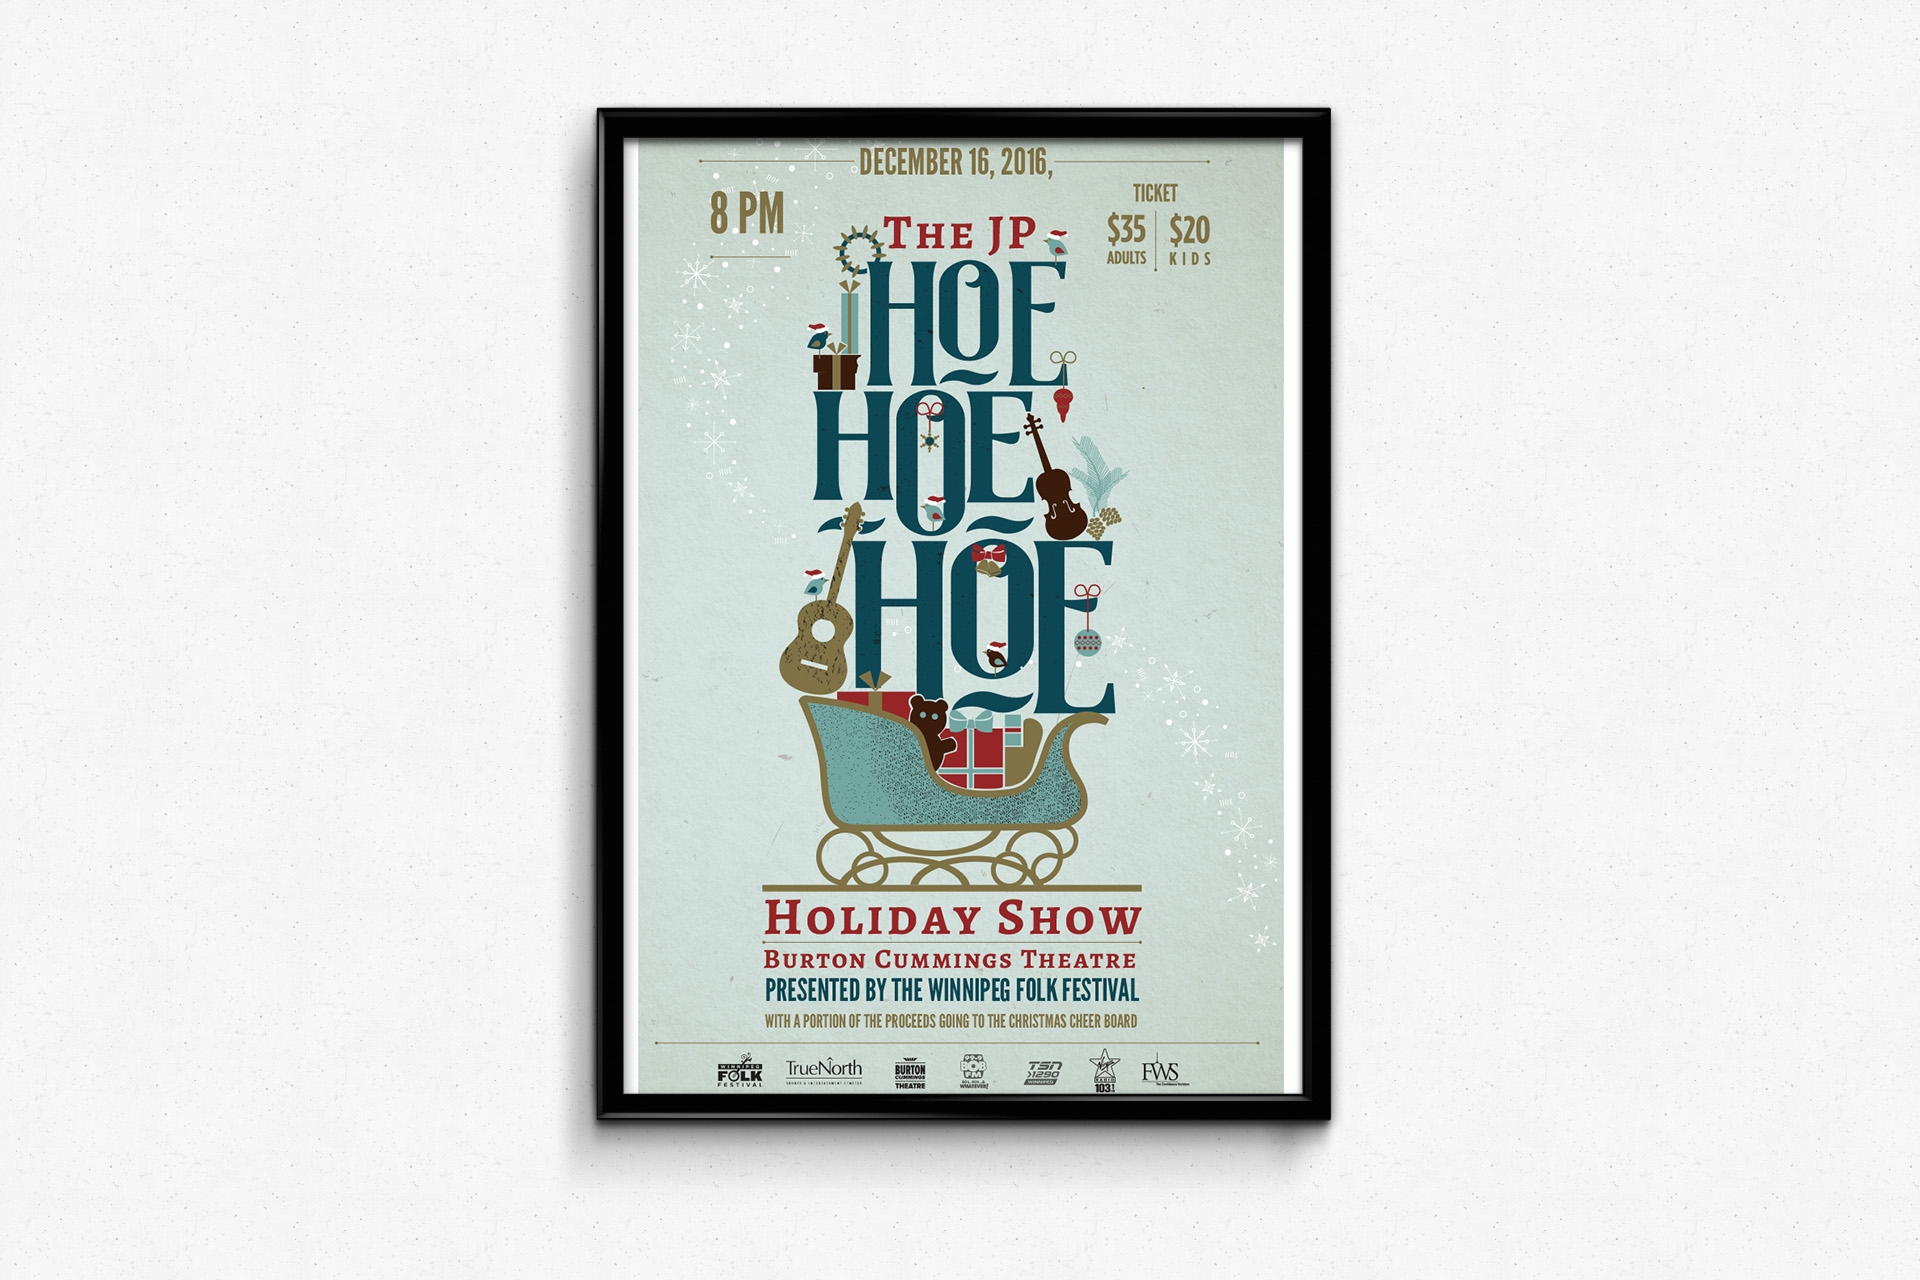 JP Hoe Hoe Hoe Holiday show!